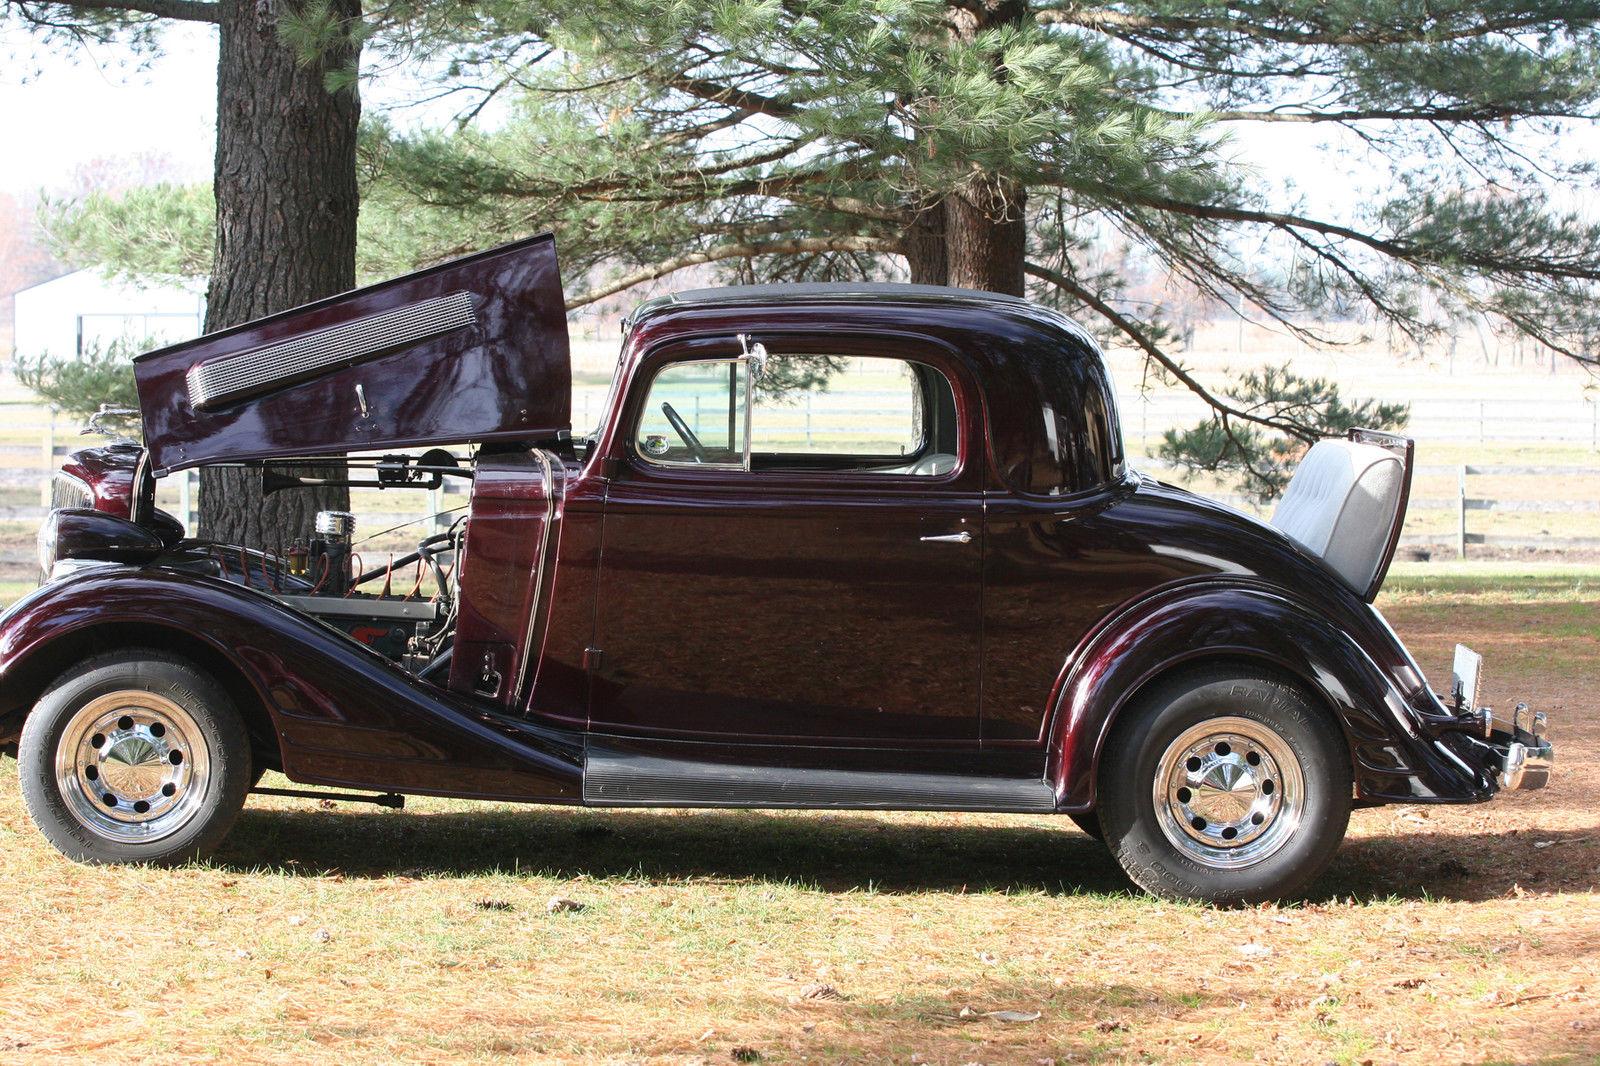 34 pontiac 3 window coupe straight 8 rumble seat orig for 1930 pontiac 3 window coupe